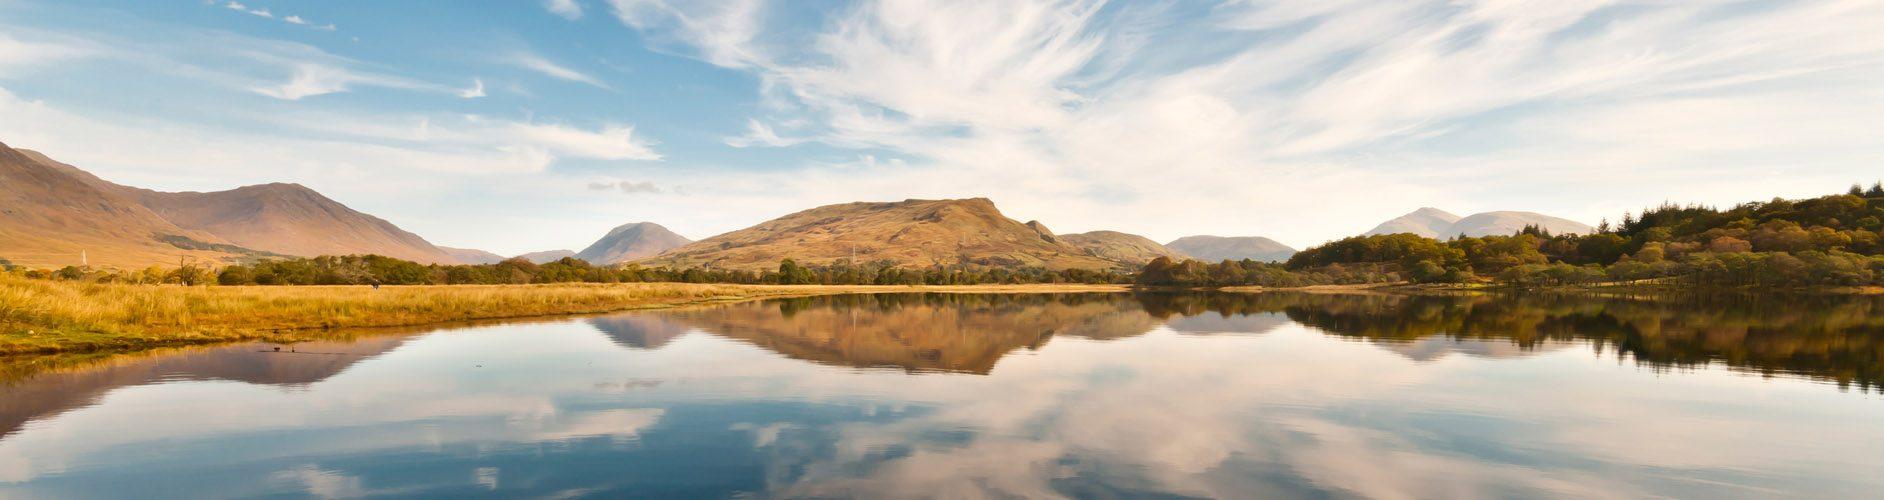 Scottish Cruises in 2018 - Cruises in Scotland | Argyll Cruising